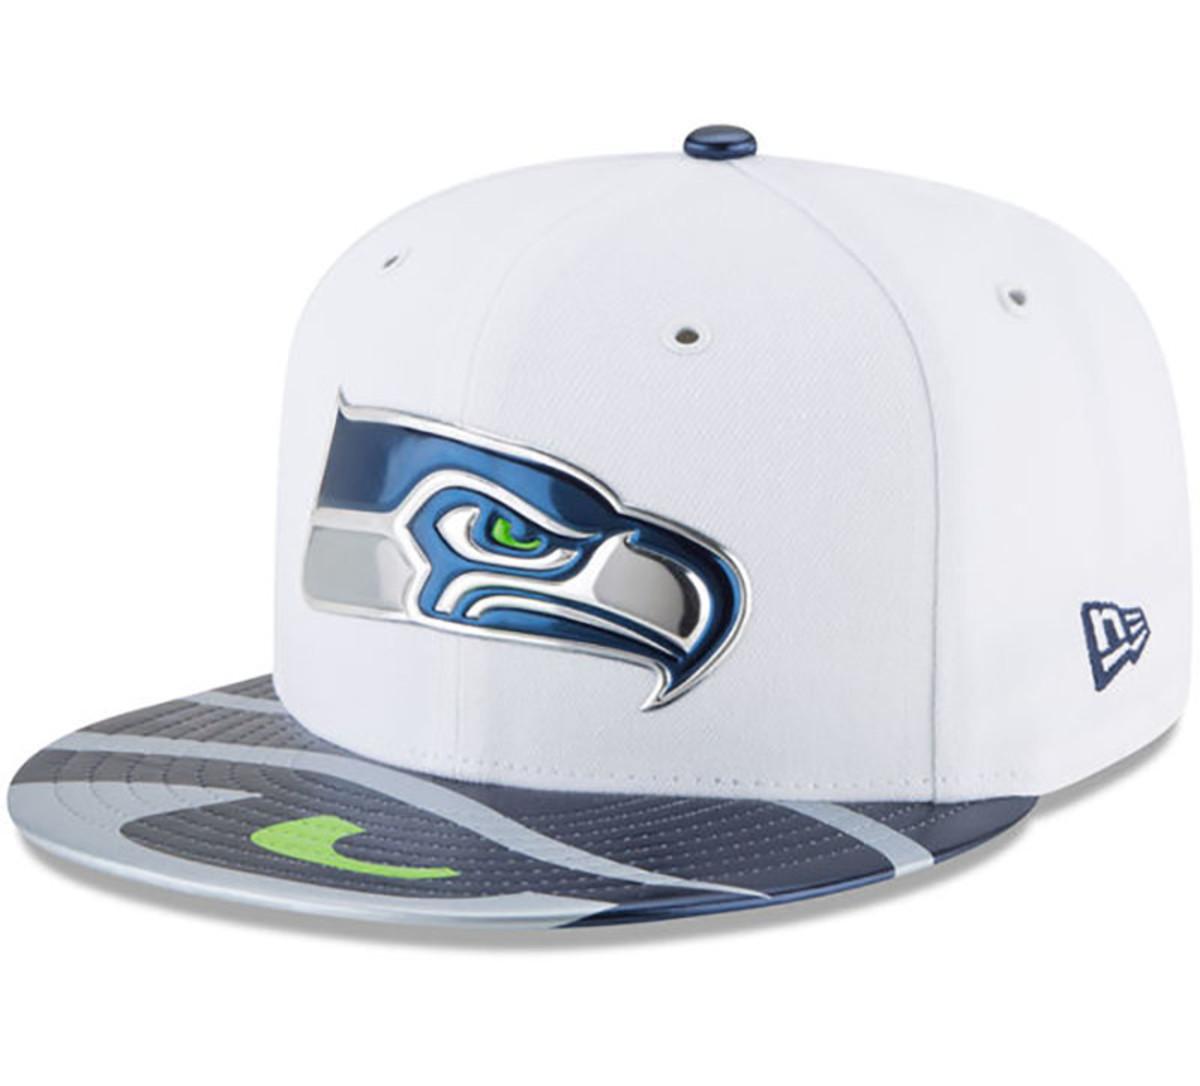 seahawks-draft-hat-ranking.jpg